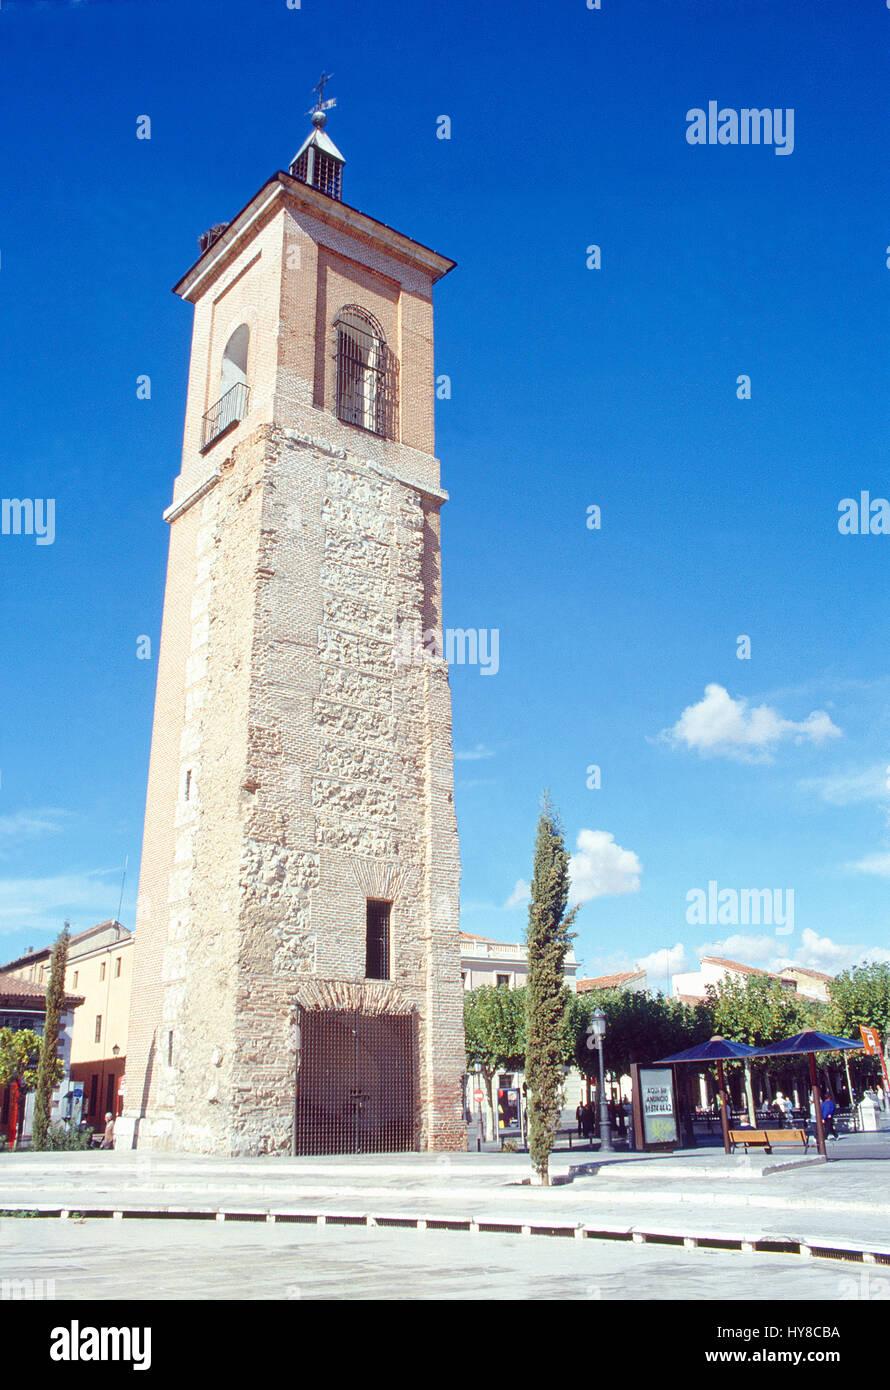 Santa Maria tower. Cervantes Square, Alcala de Henares, Madrid province, Spain. - Stock Image